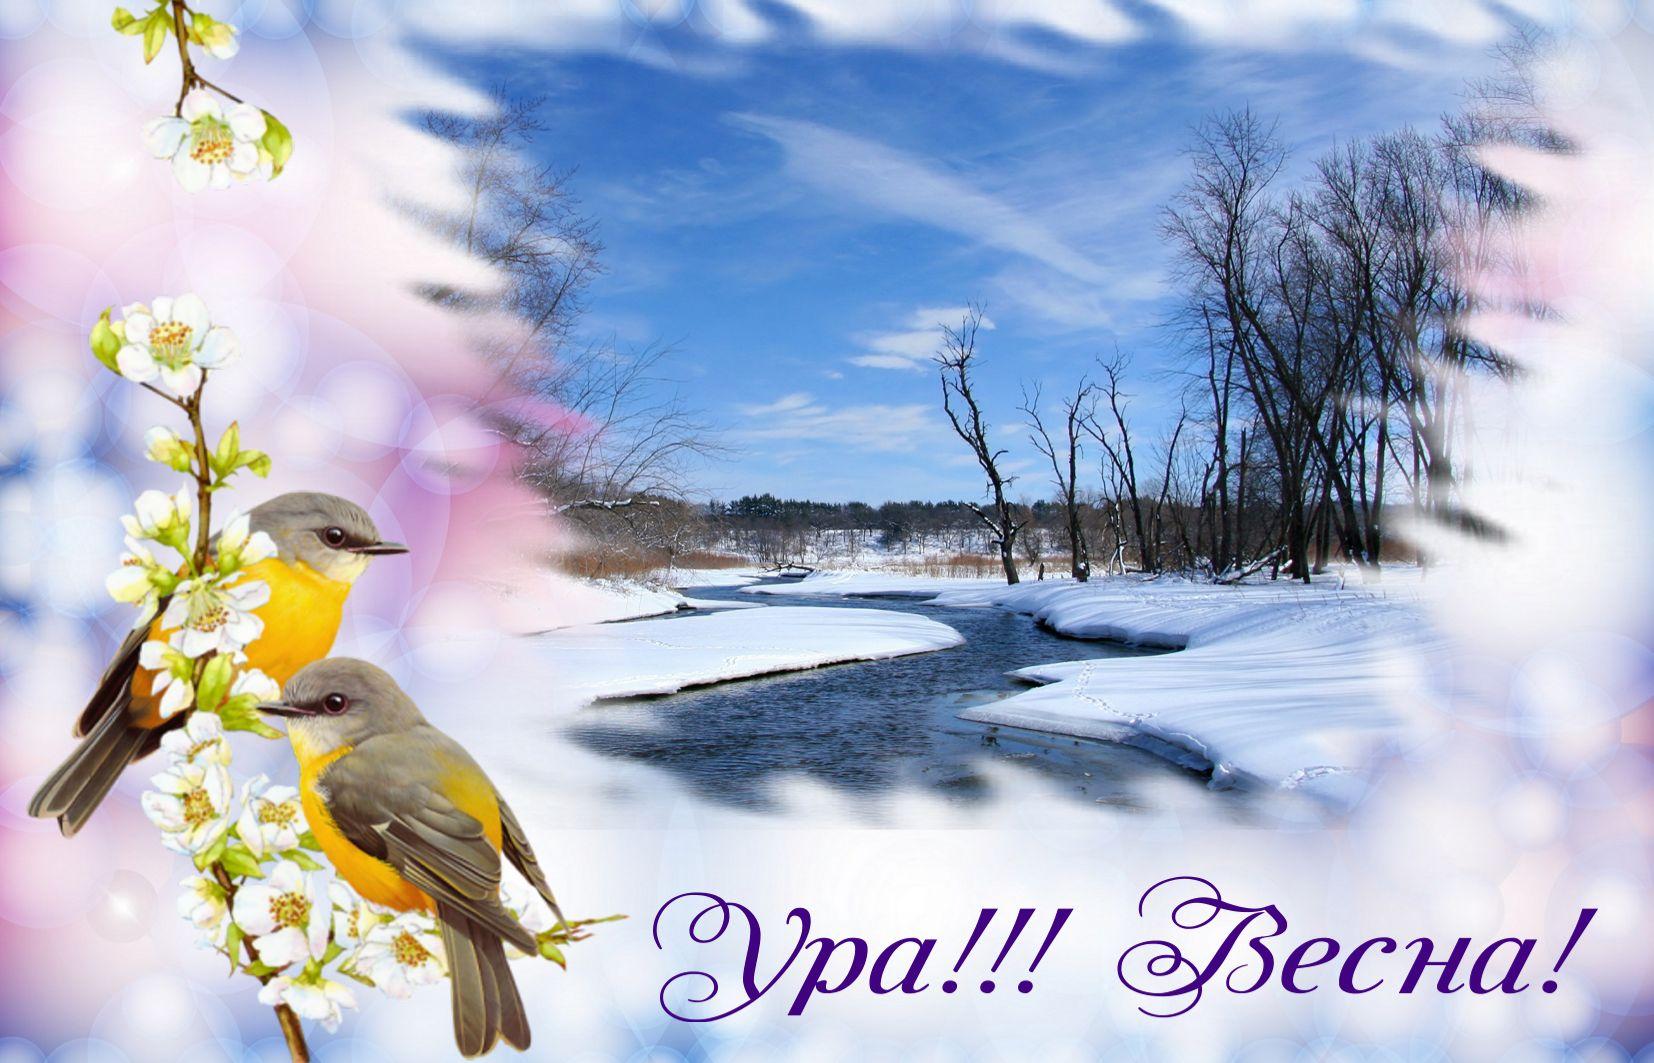 Весна ура картинка